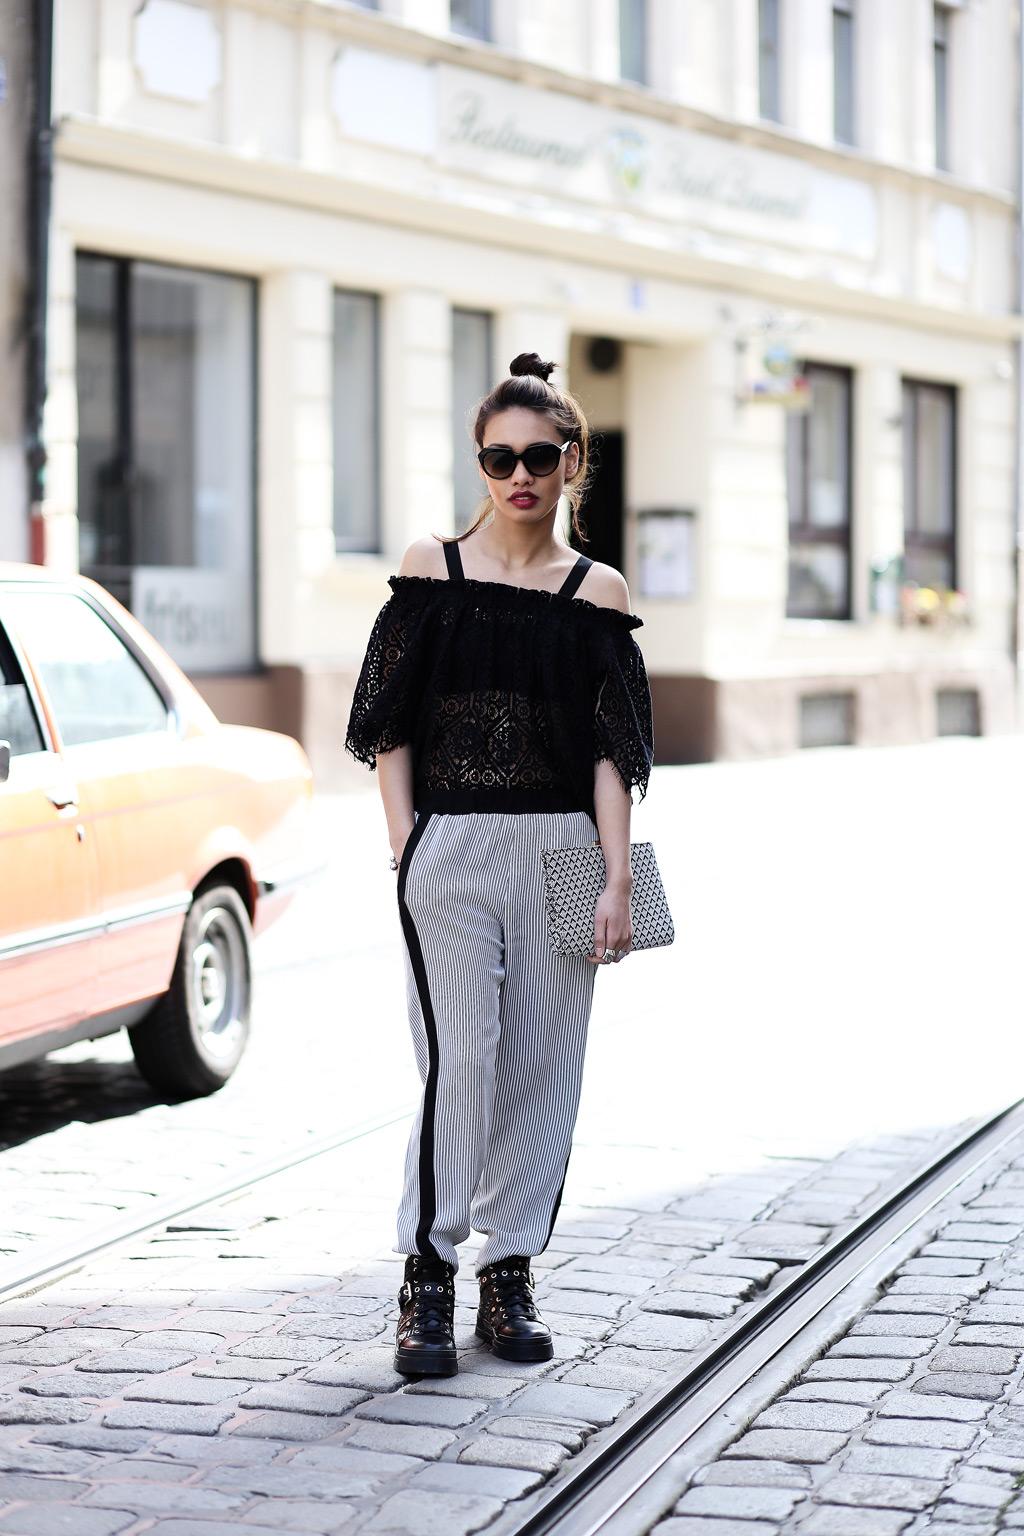 thefashionanarchy_anniep._outfit_style_look_spitze_lace_munichblogger_blogger_fashionblogger_munich_muenchen_fashionblogger_ash_sneaker_3